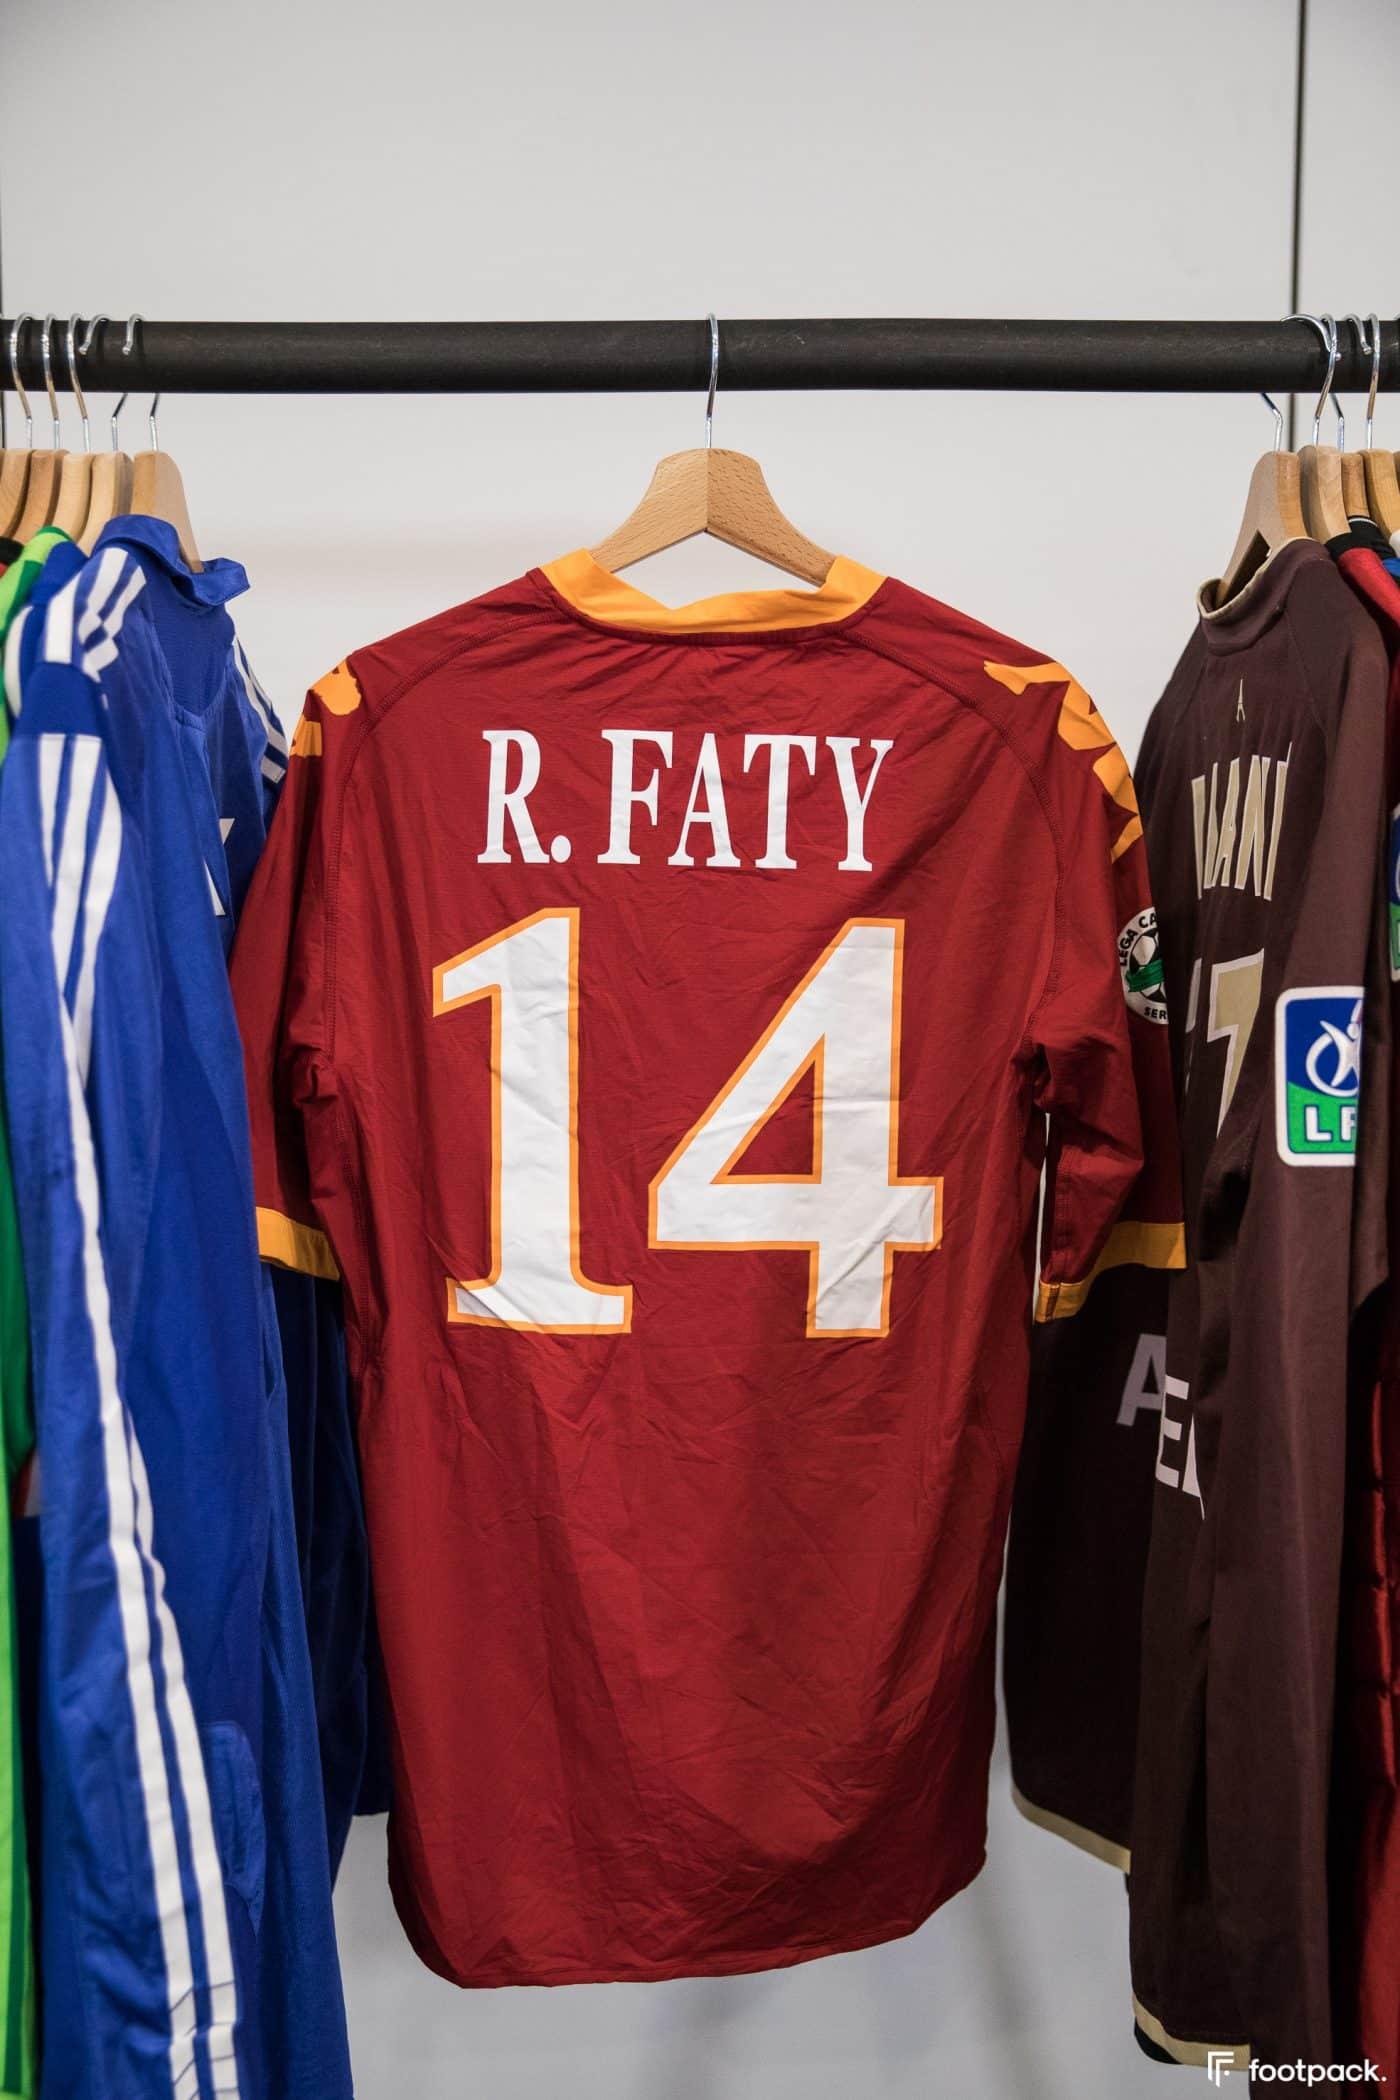 maillots-de-match-footpack-ricardo-faty-9